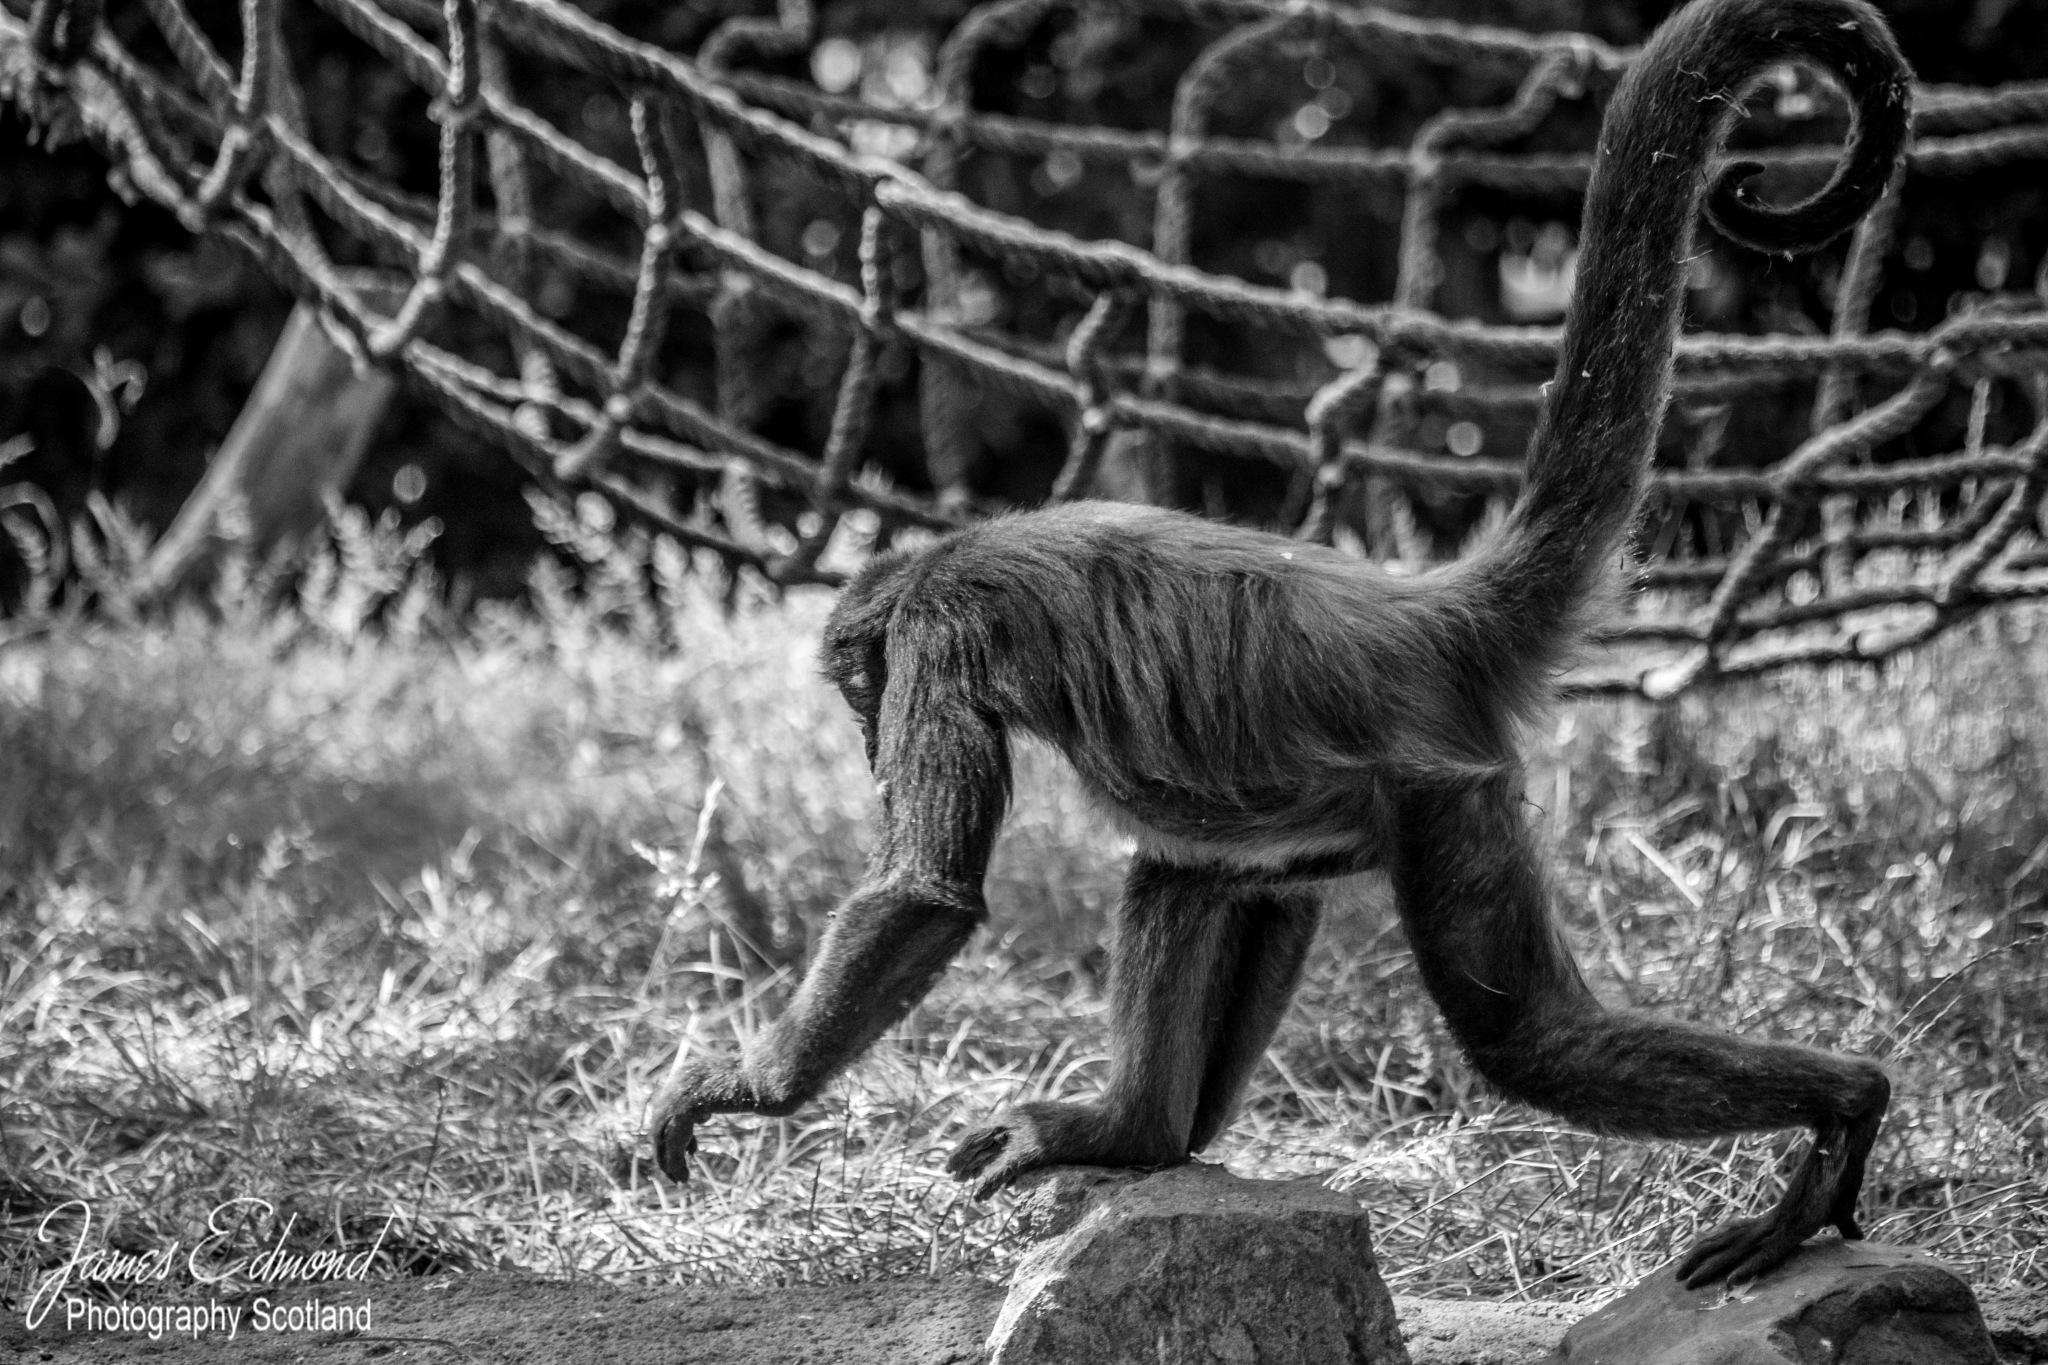 Spider Monkey by James Edmond Photography